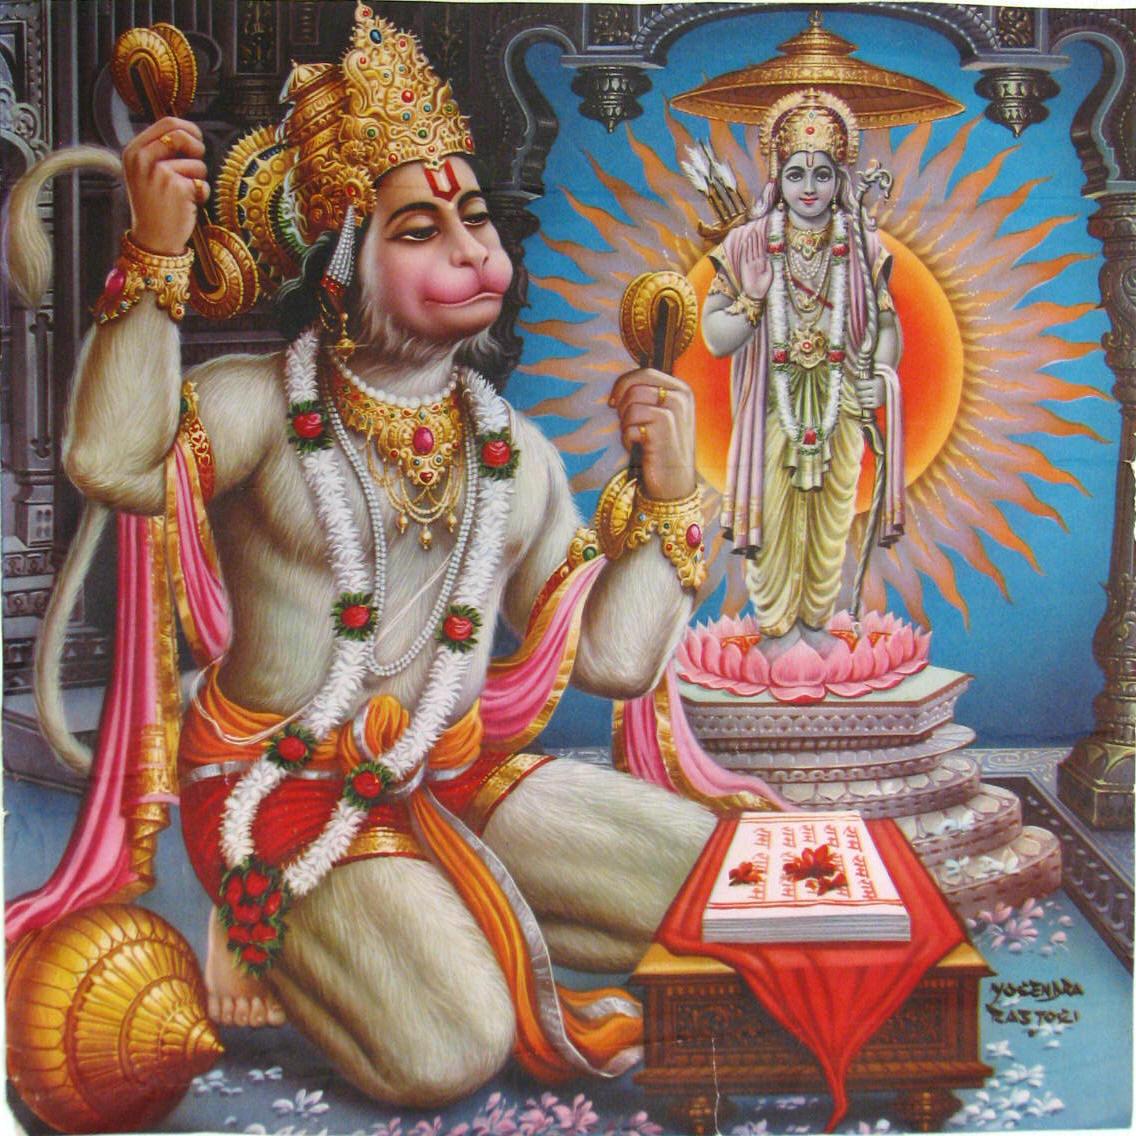 http://1.bp.blogspot.com/_AeyAJJPoi-o/S7ltMDTNYmI/AAAAAAAACz0/ufGKJj8rCaY/s1600/hanuman-praying-to-shri-ram.jpg